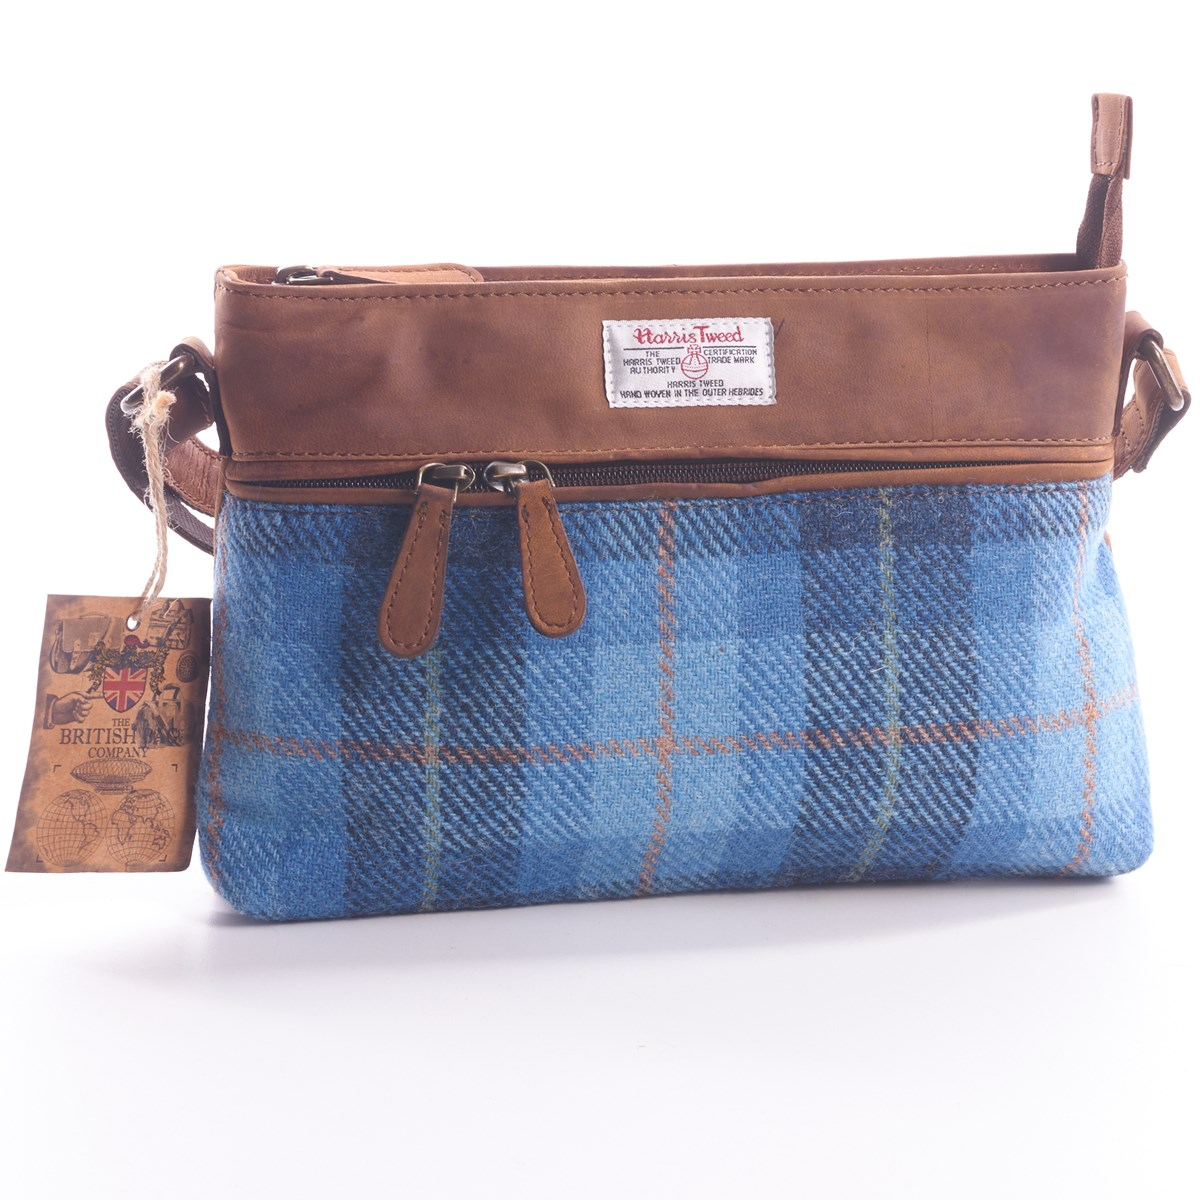 1b6bcb1904 Ladies Castlebay Handbag - The Kilt Store